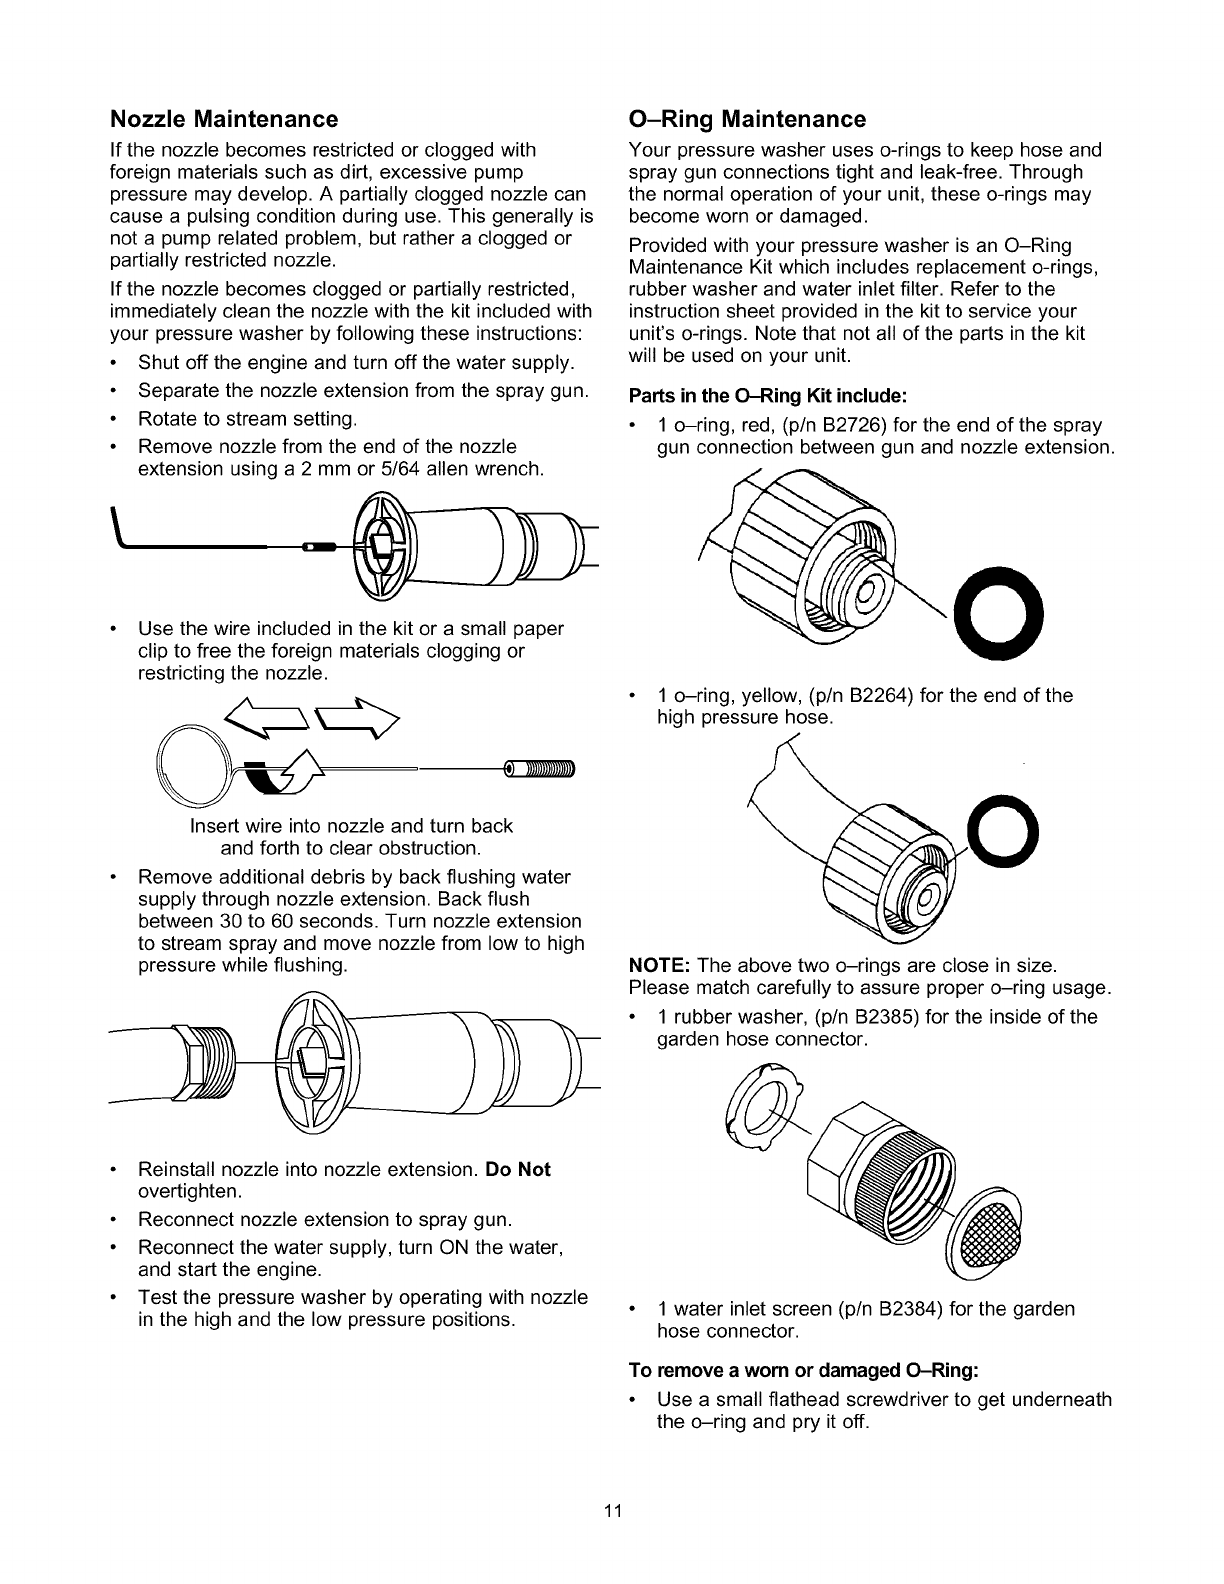 Craftsman 580768210 User Manual Pressure Washer Manuals And Guides Ring Flat Baja M8 Nozzle Maintenance